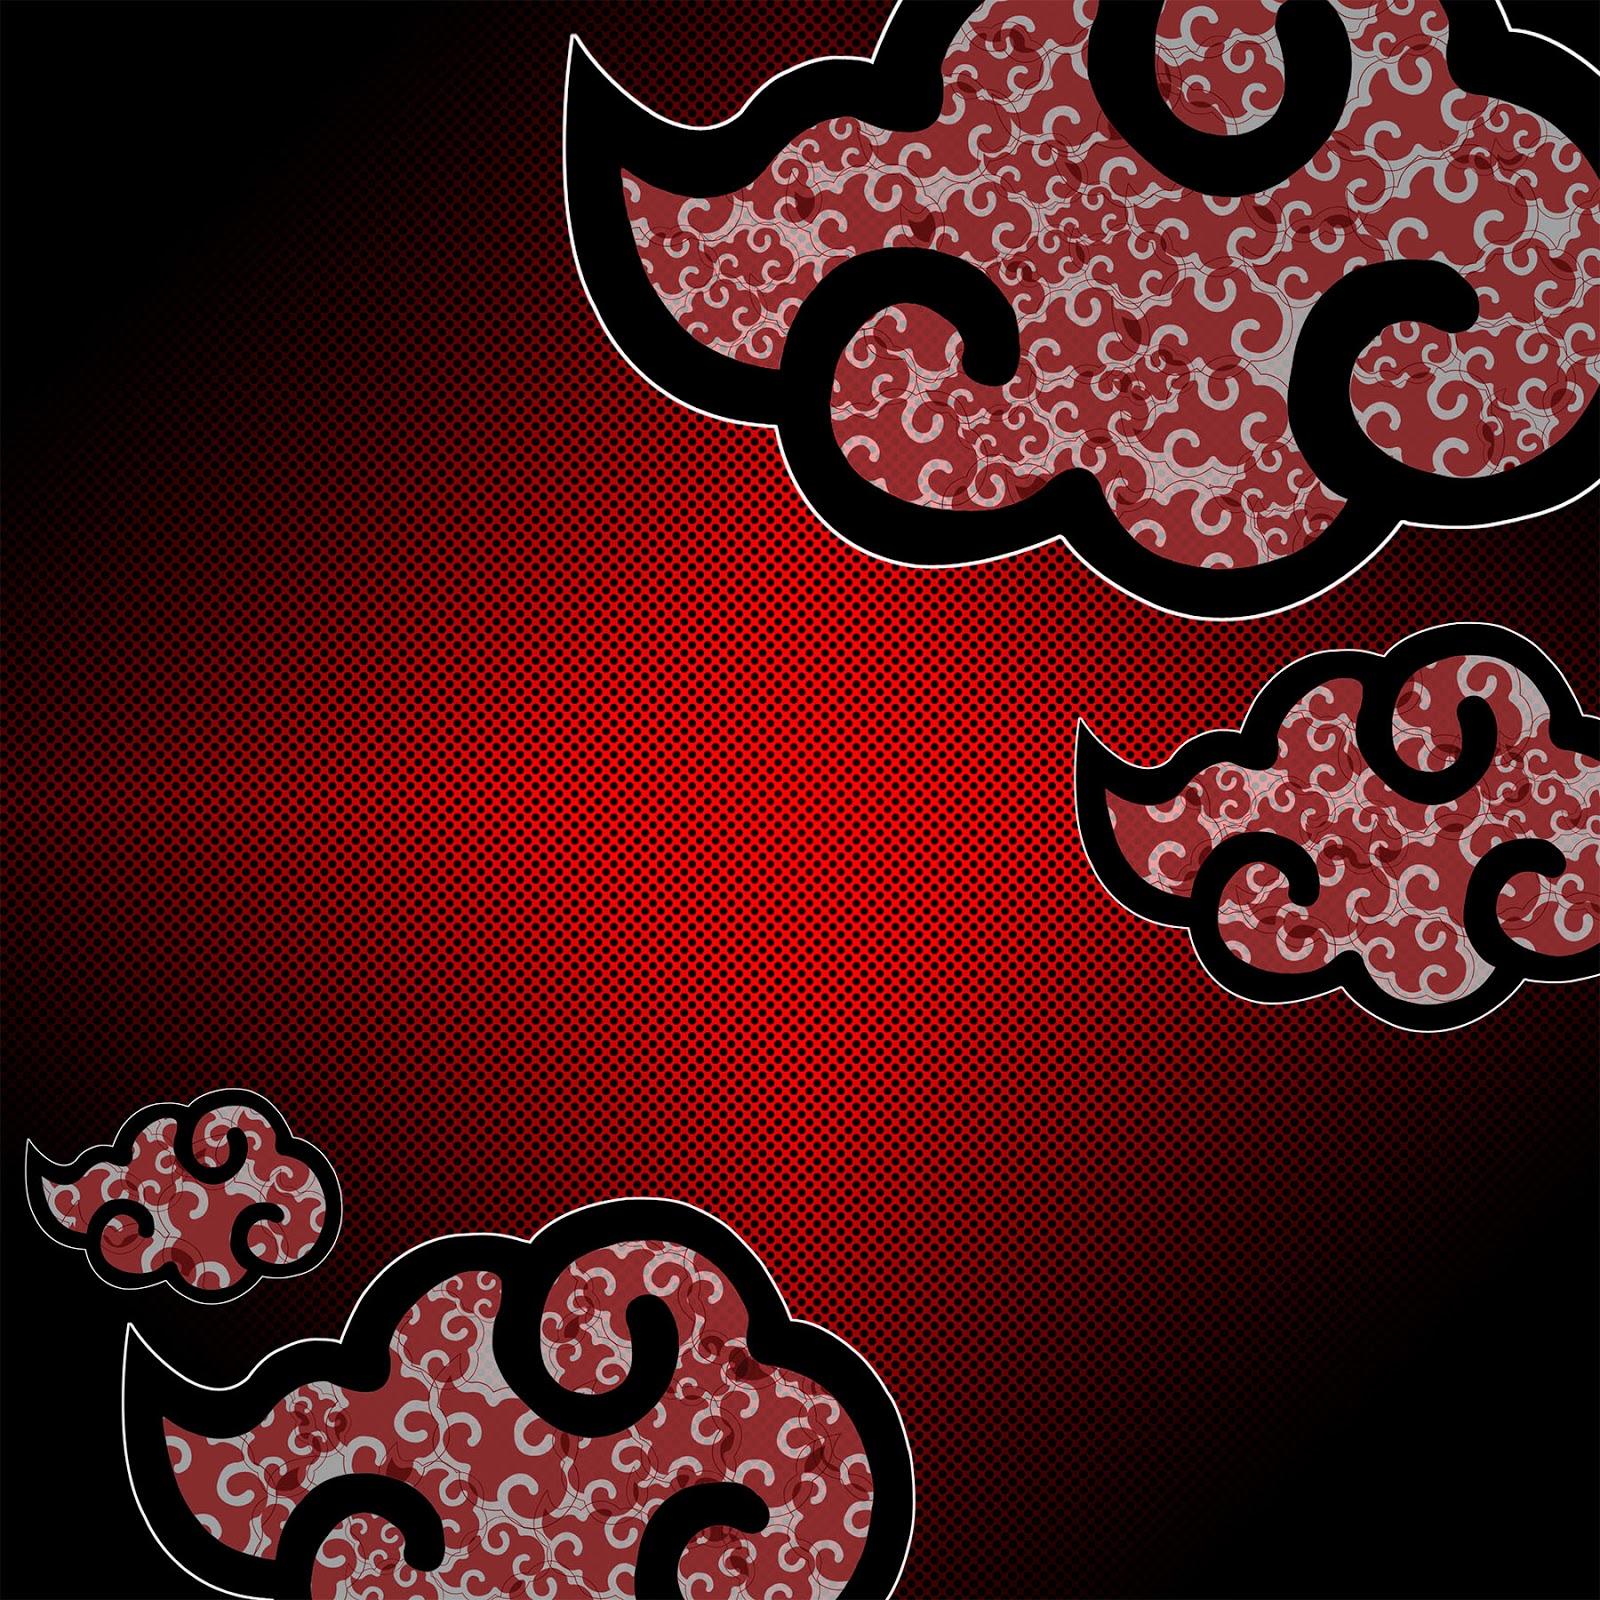 Cloud Wallpaper Hd: Akatsuki Cloud Wallpaper